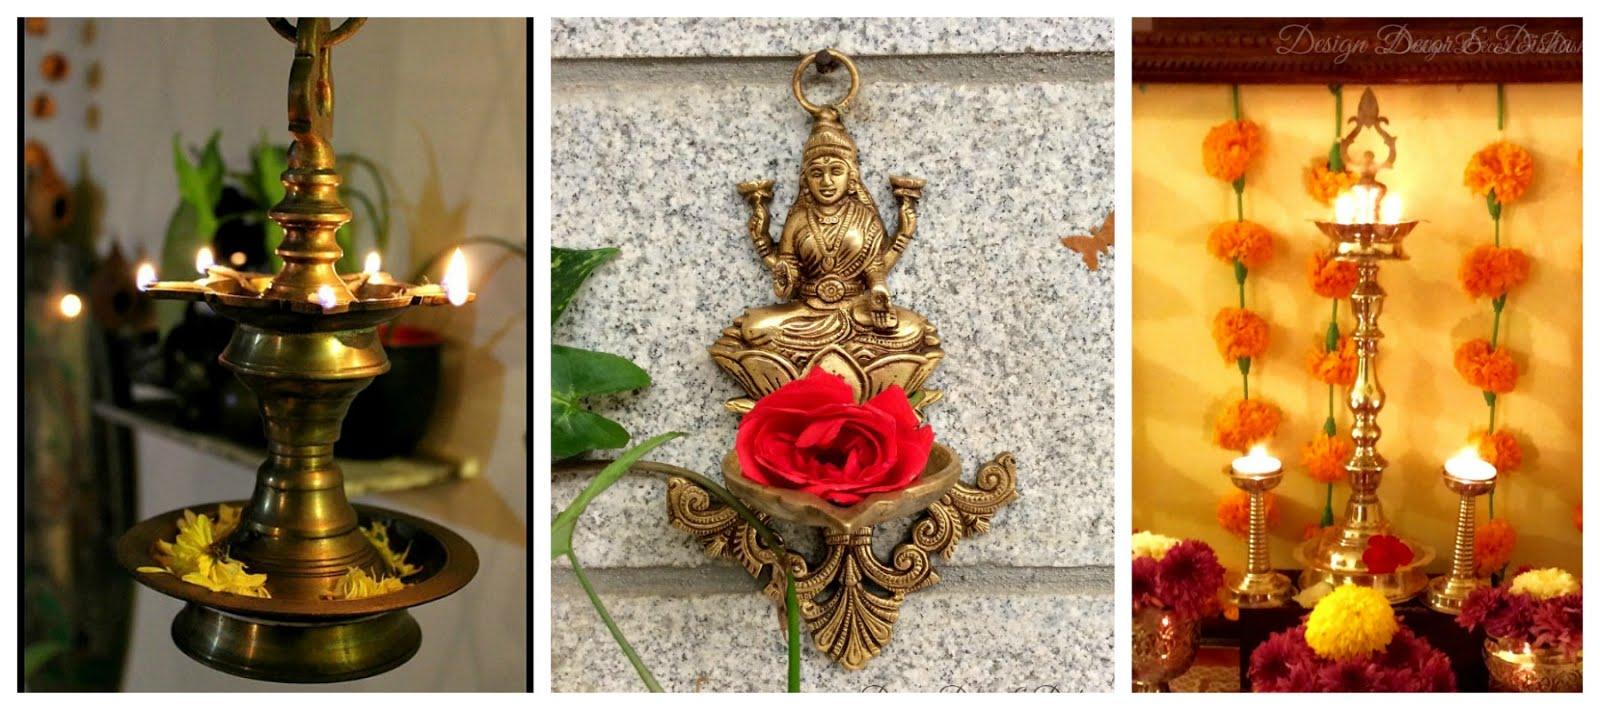 An Indian Design & Decor Blog